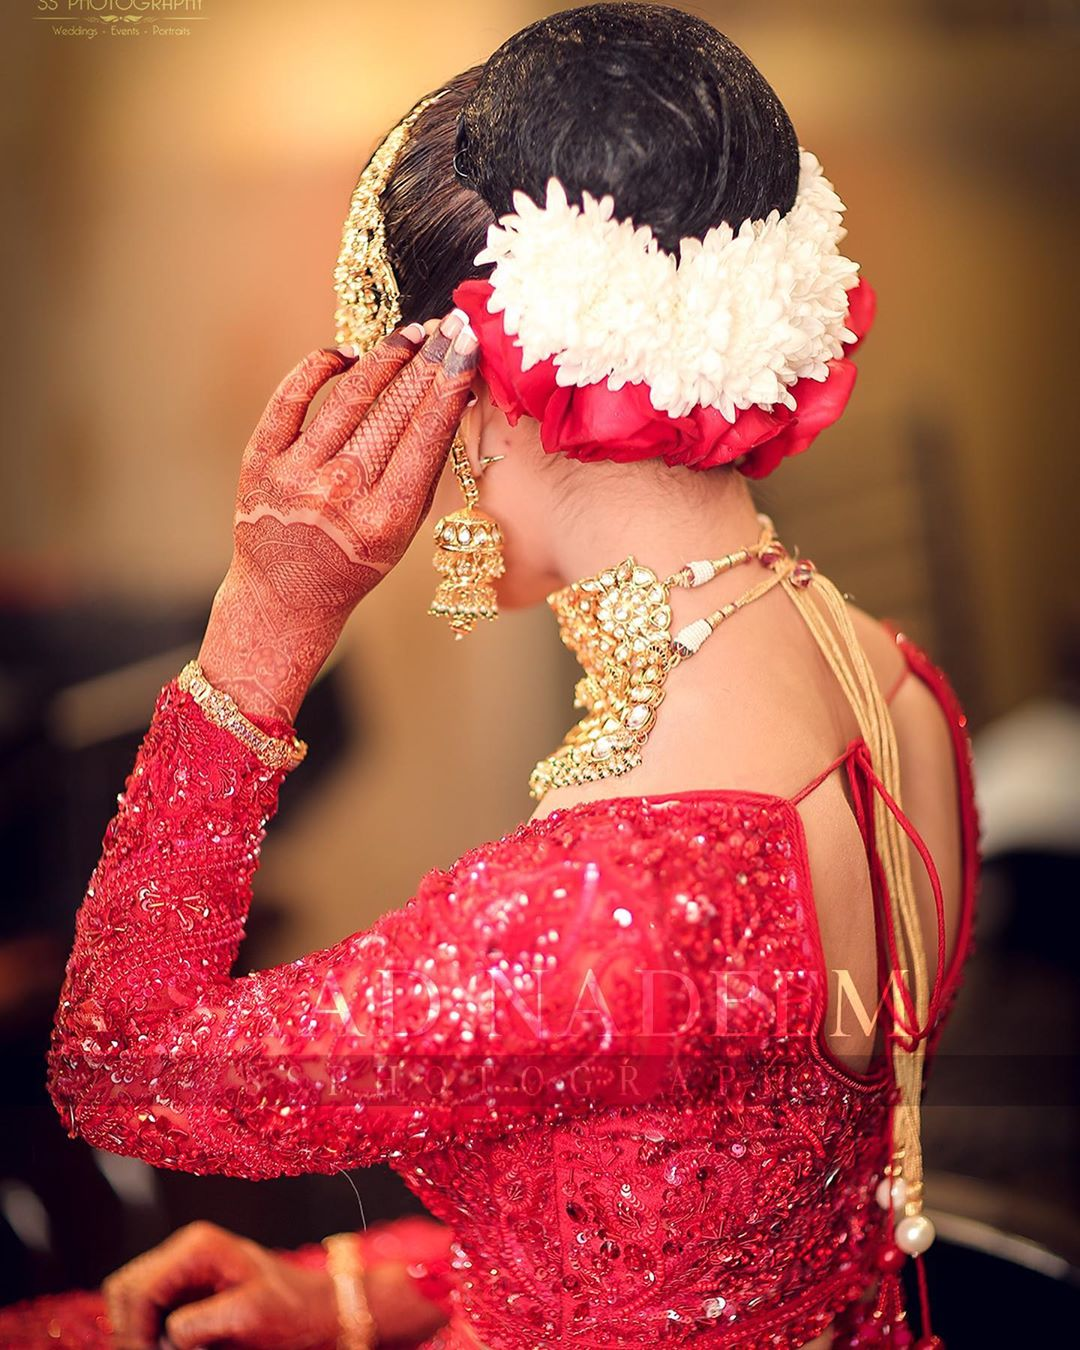 Iqra Aziz and Yasir Hussain Wedding Pictures (4)